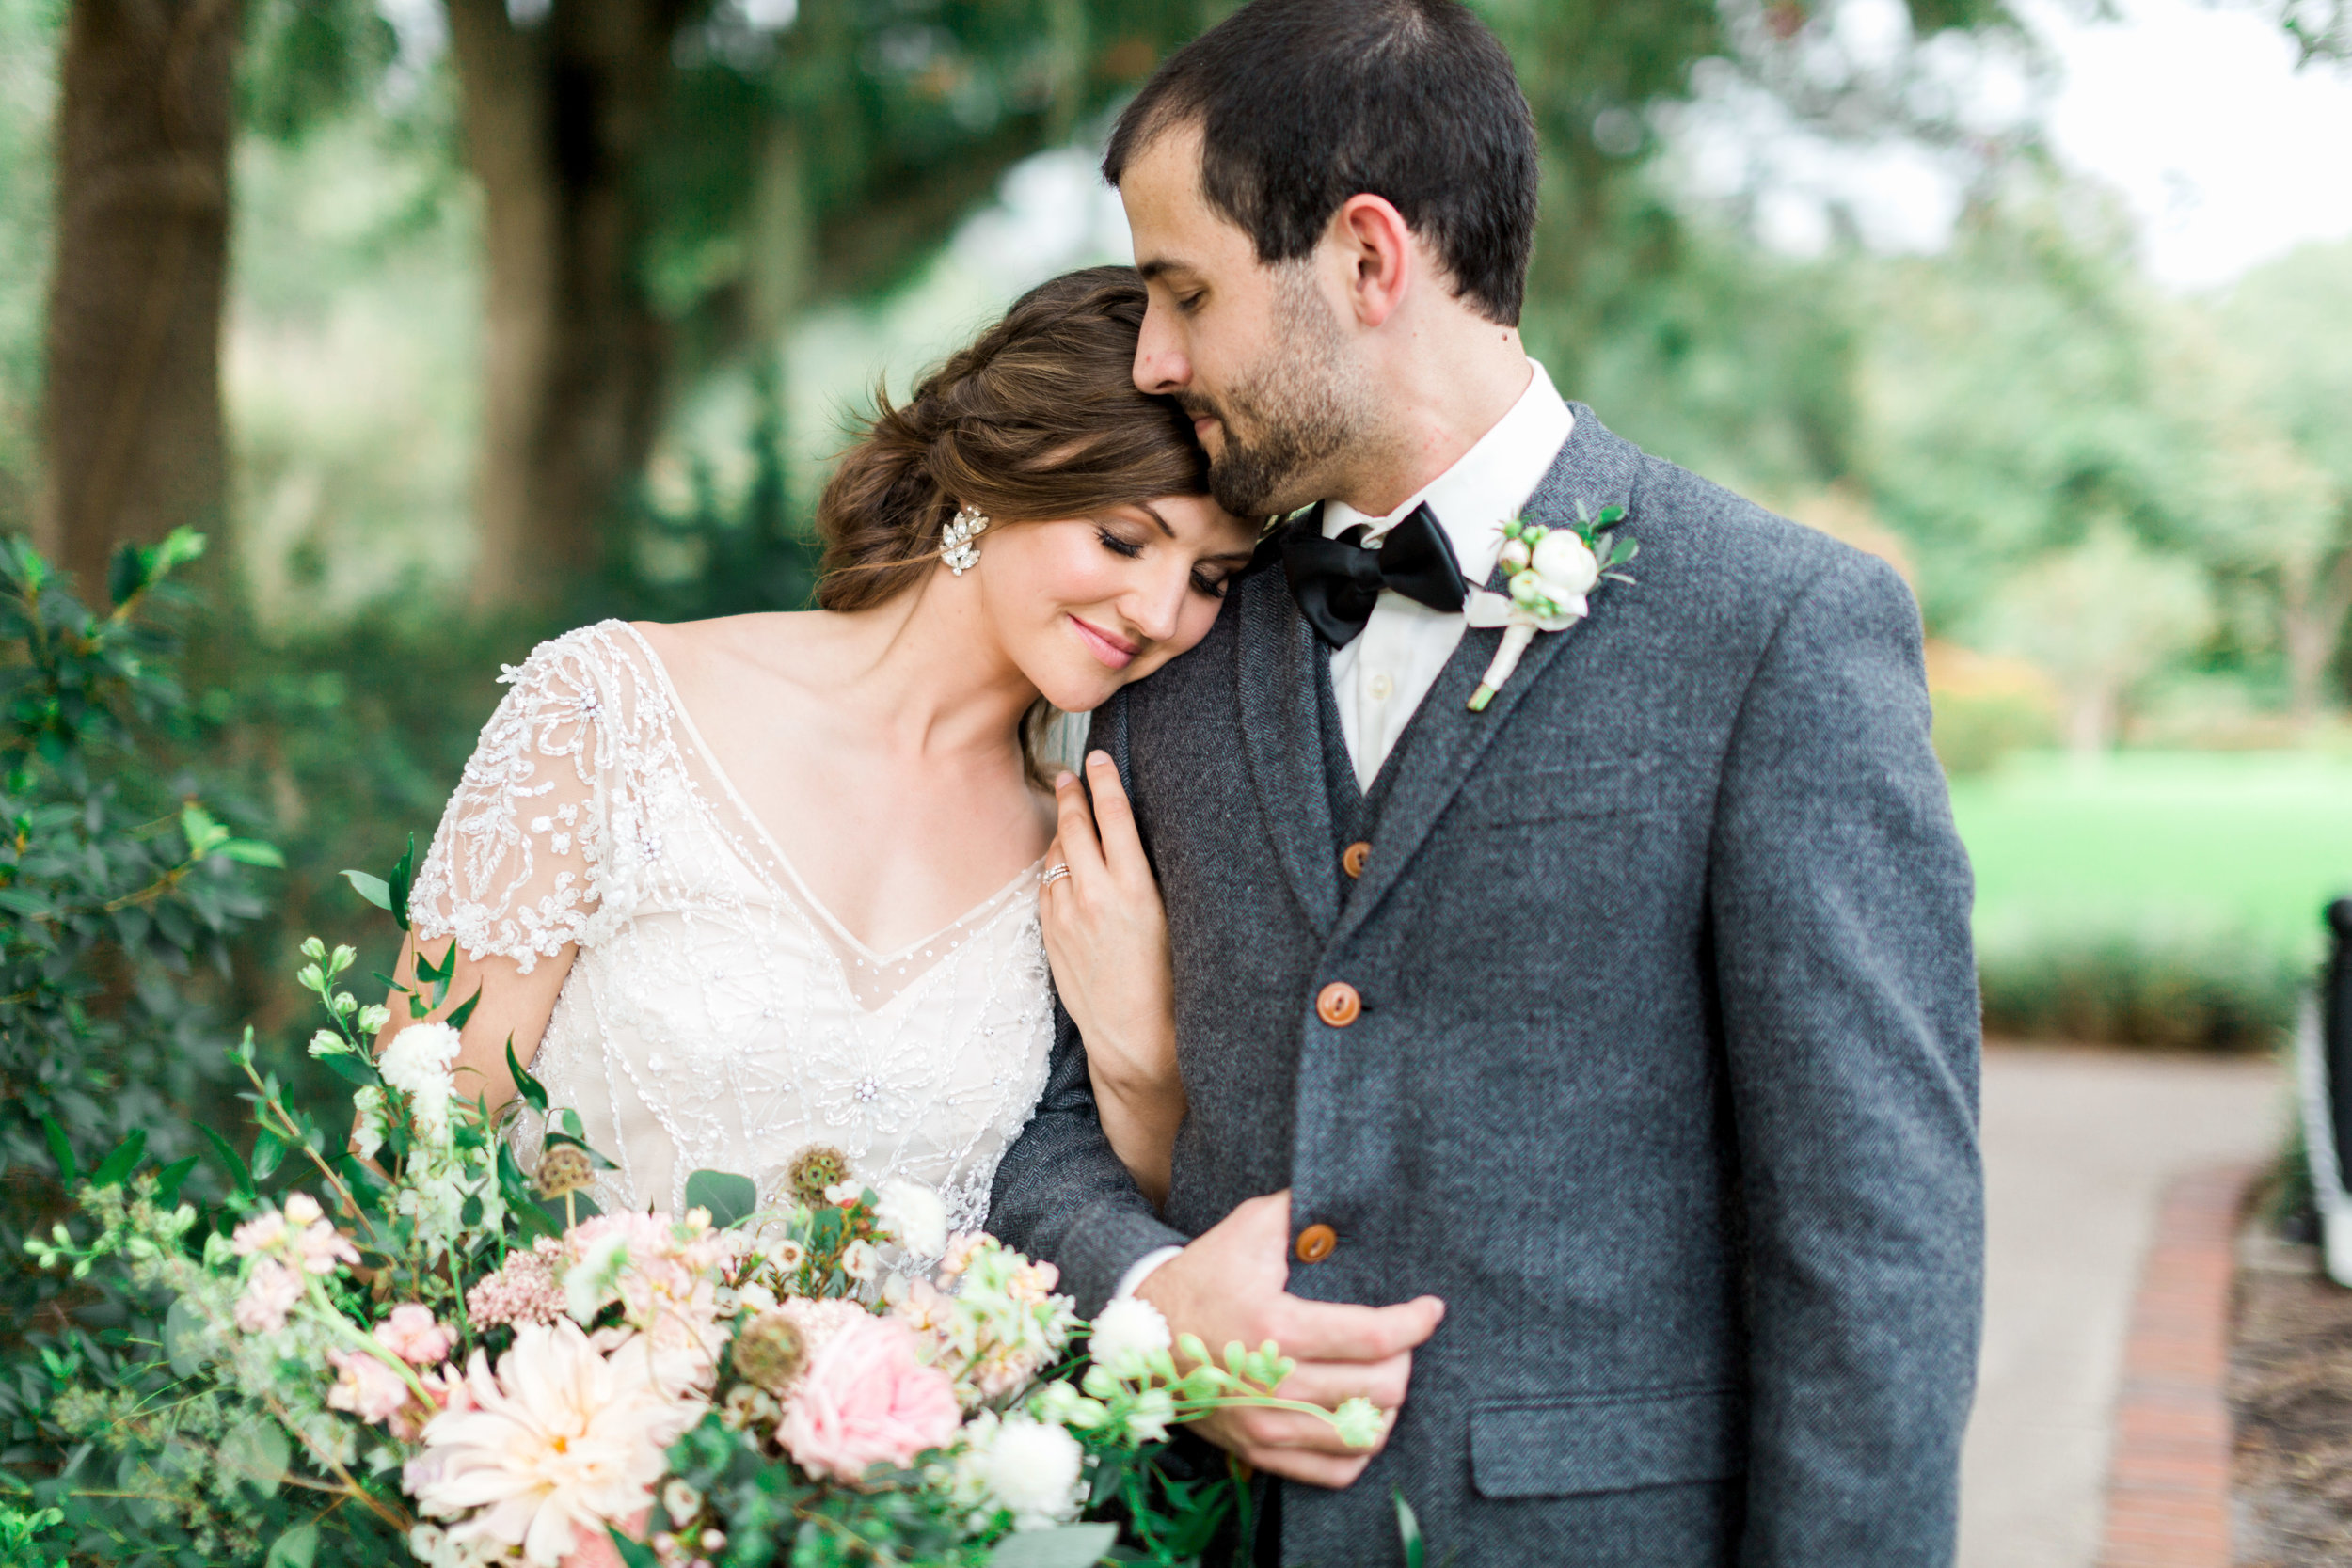 cypress grove estate house, orlando florida wedding photo shoot, bride and groom